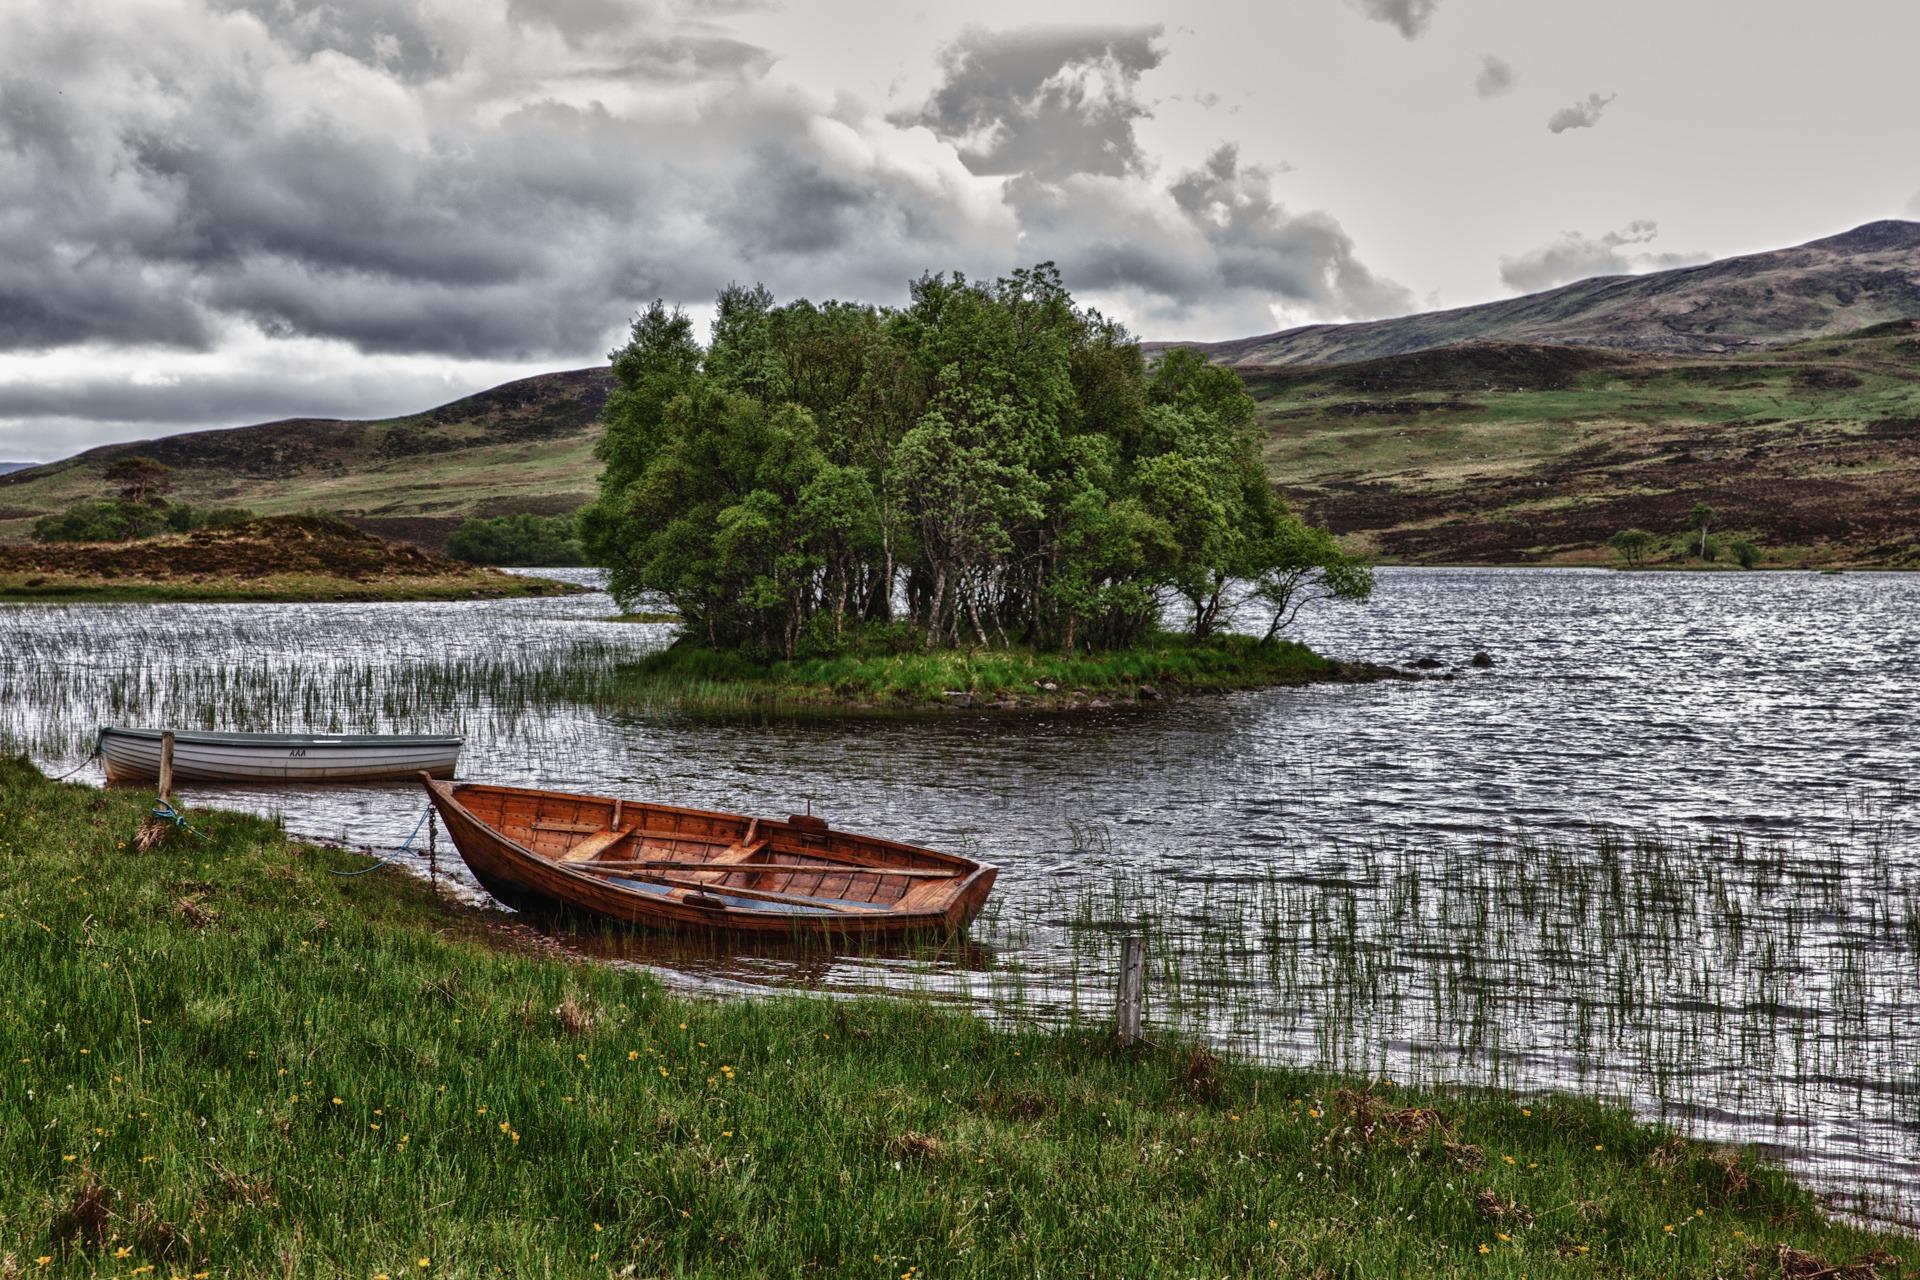 94944 Заставки и Обои Лодки на телефон. Скачать Природа, Лодки, Река, Деревья, Трава, Облака картинки бесплатно